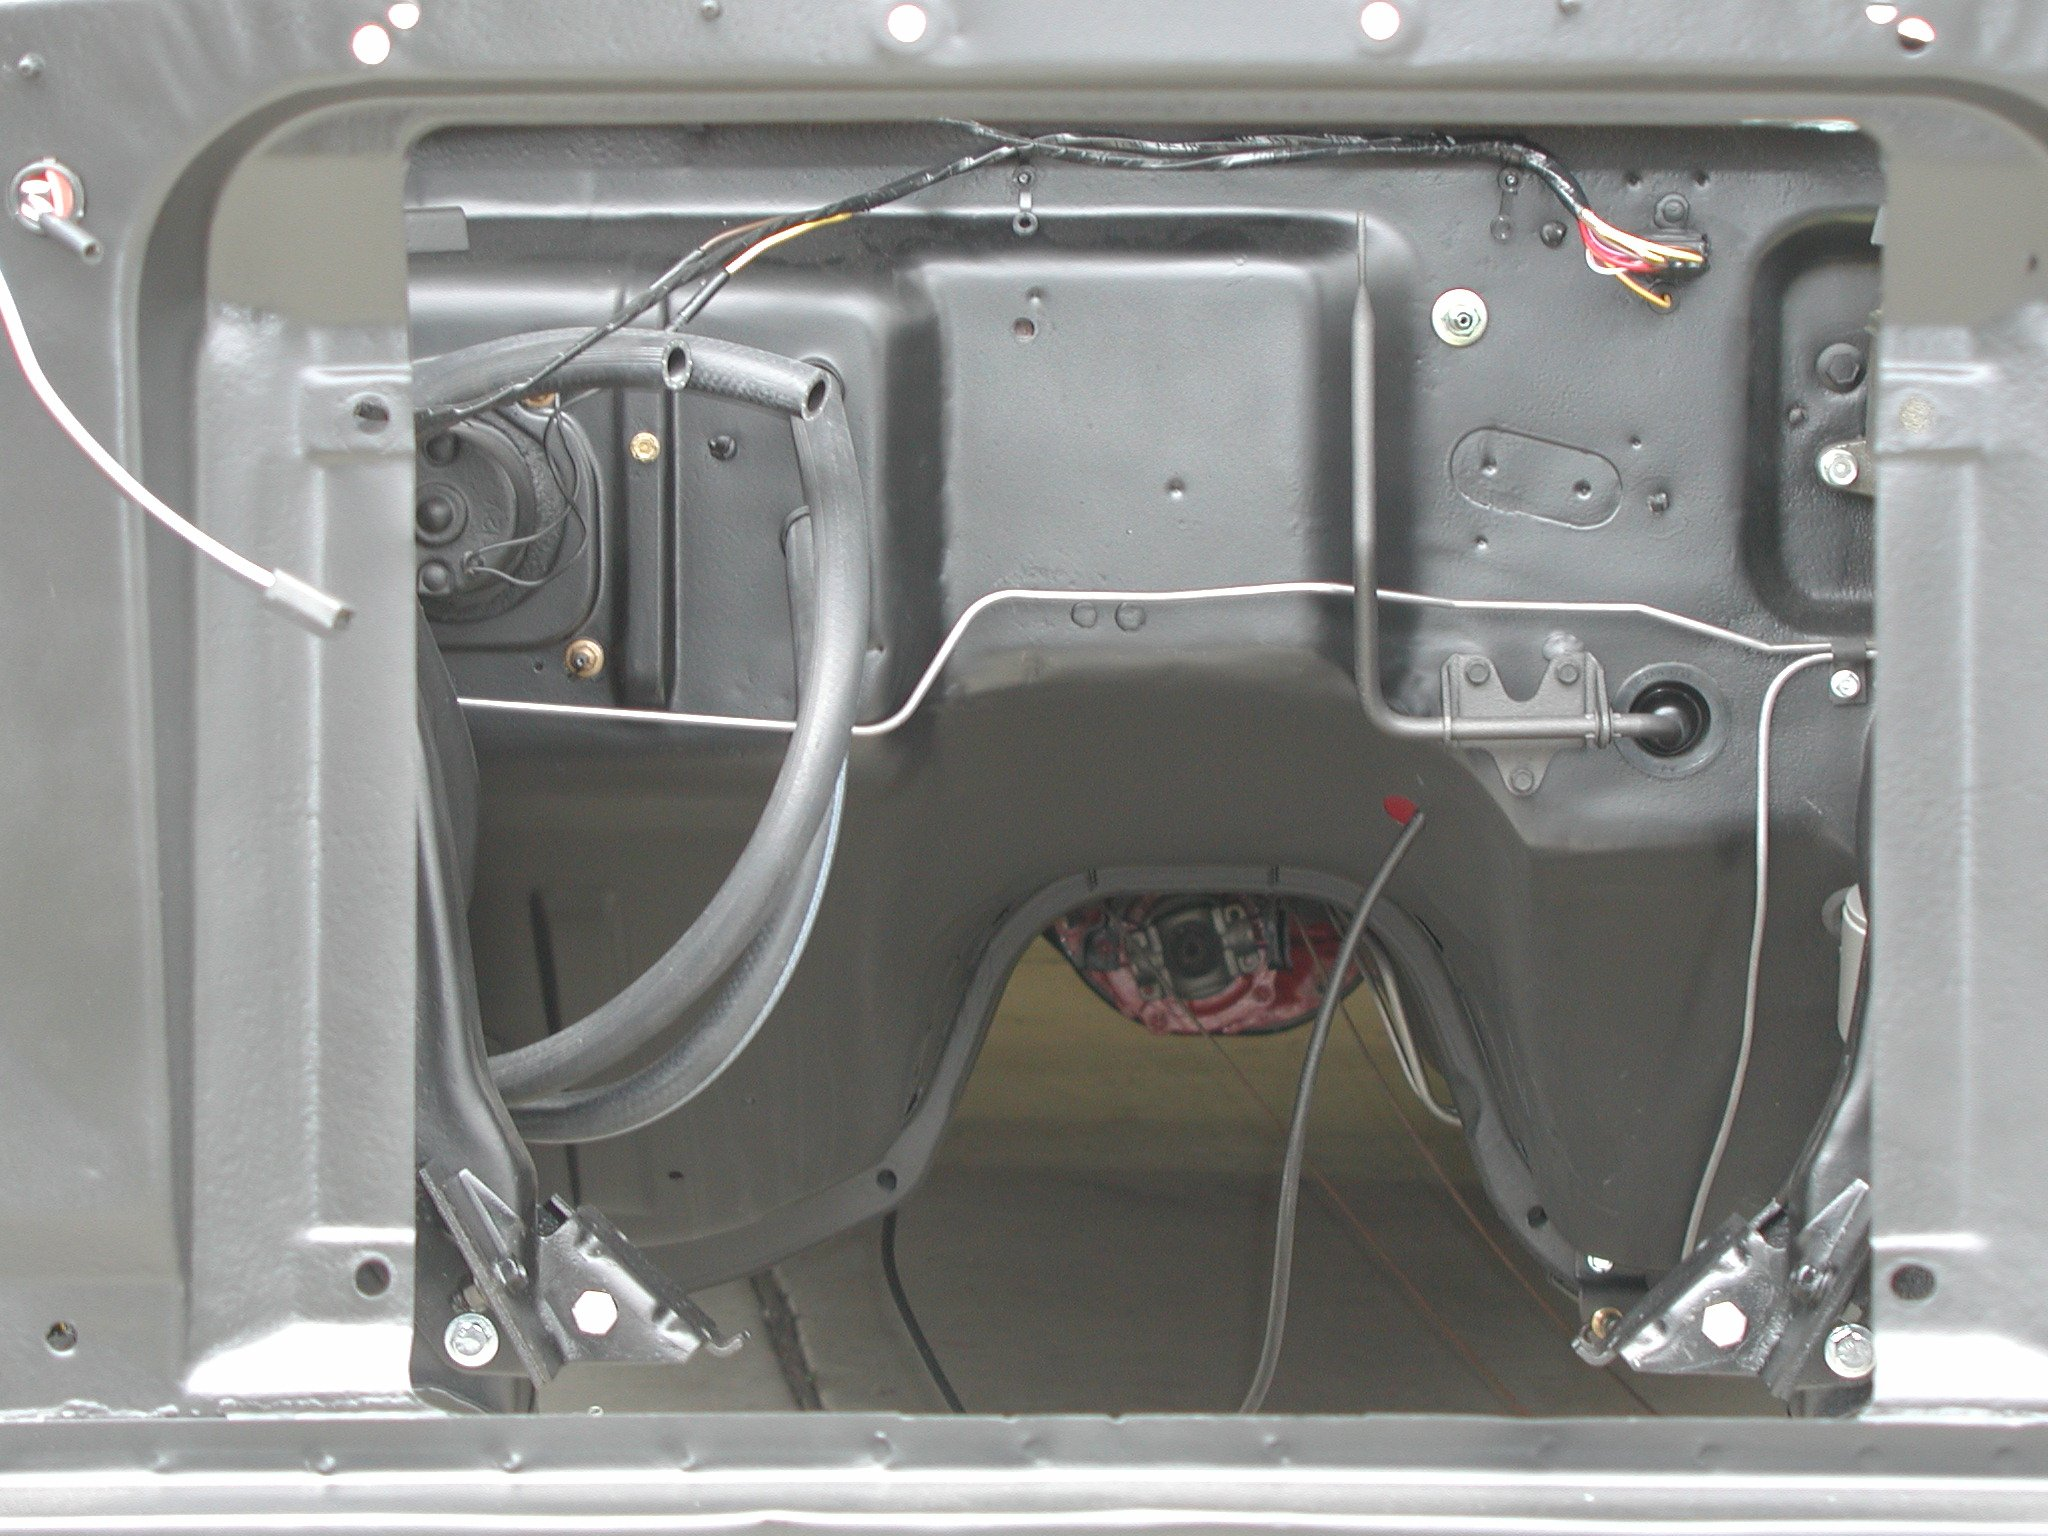 1966 Mustang Engine Bay Detailing Ford Mustang Forum